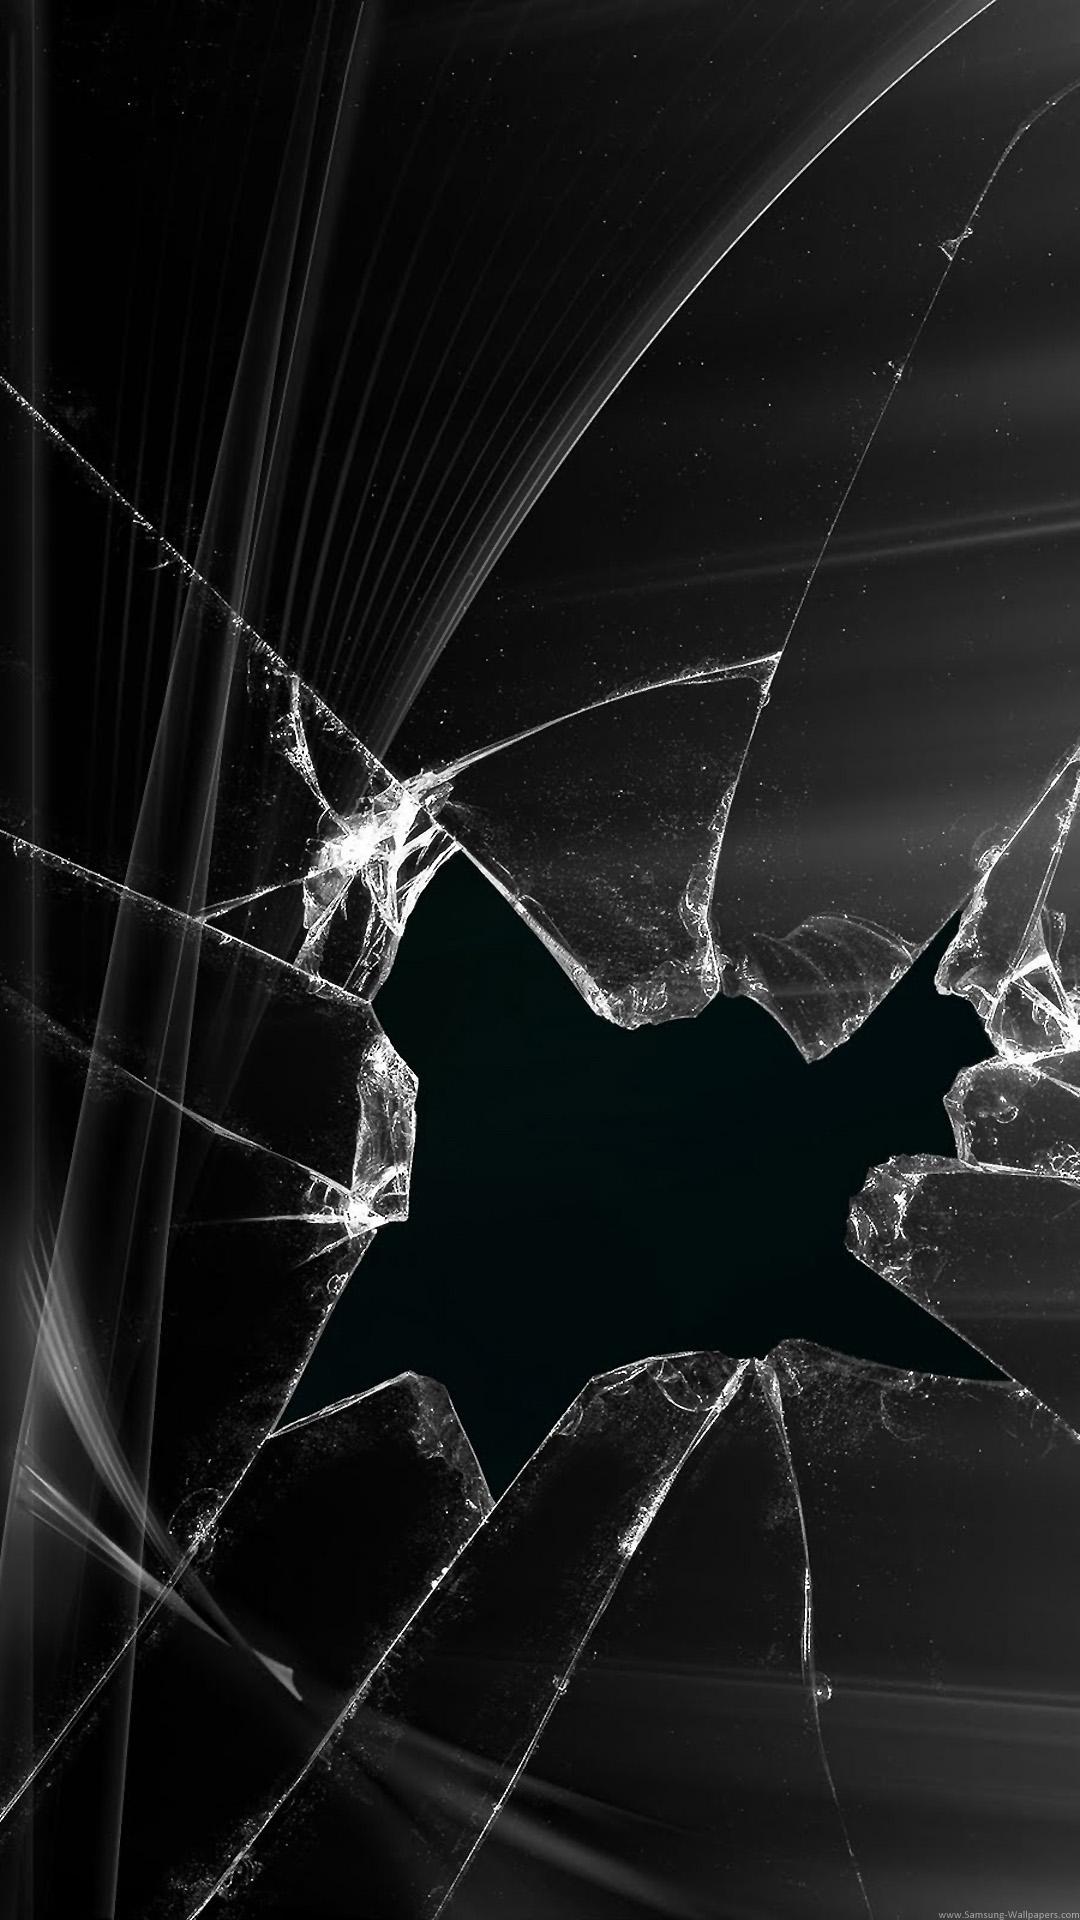 broken-screen-black-abstract-picture-cracked-screen-1080%C3%971920-wallpaper-wpc9203240